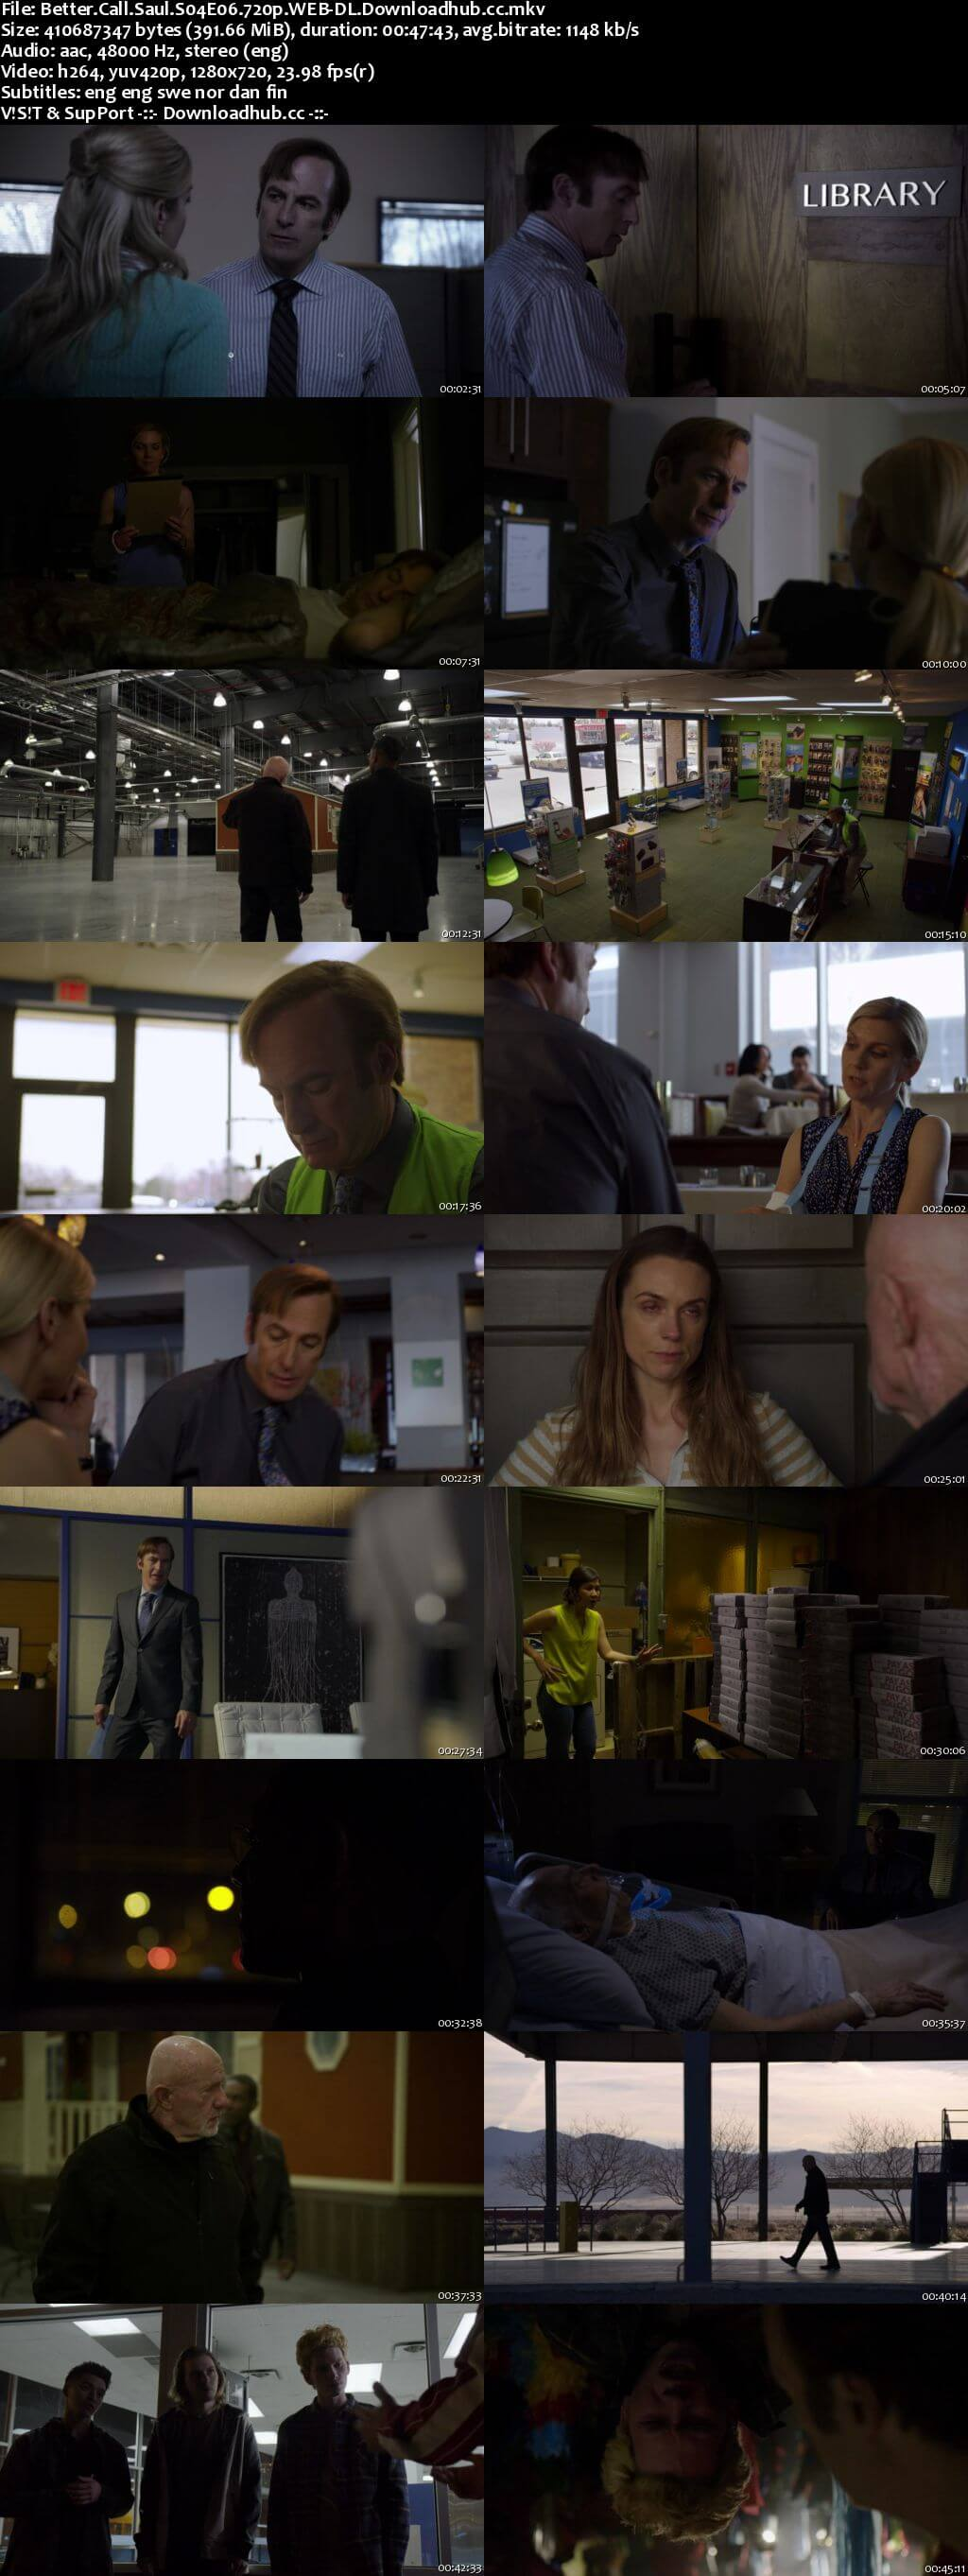 Better Call Saul S04E06 400MB WEB-DL 720p x264 MSubs